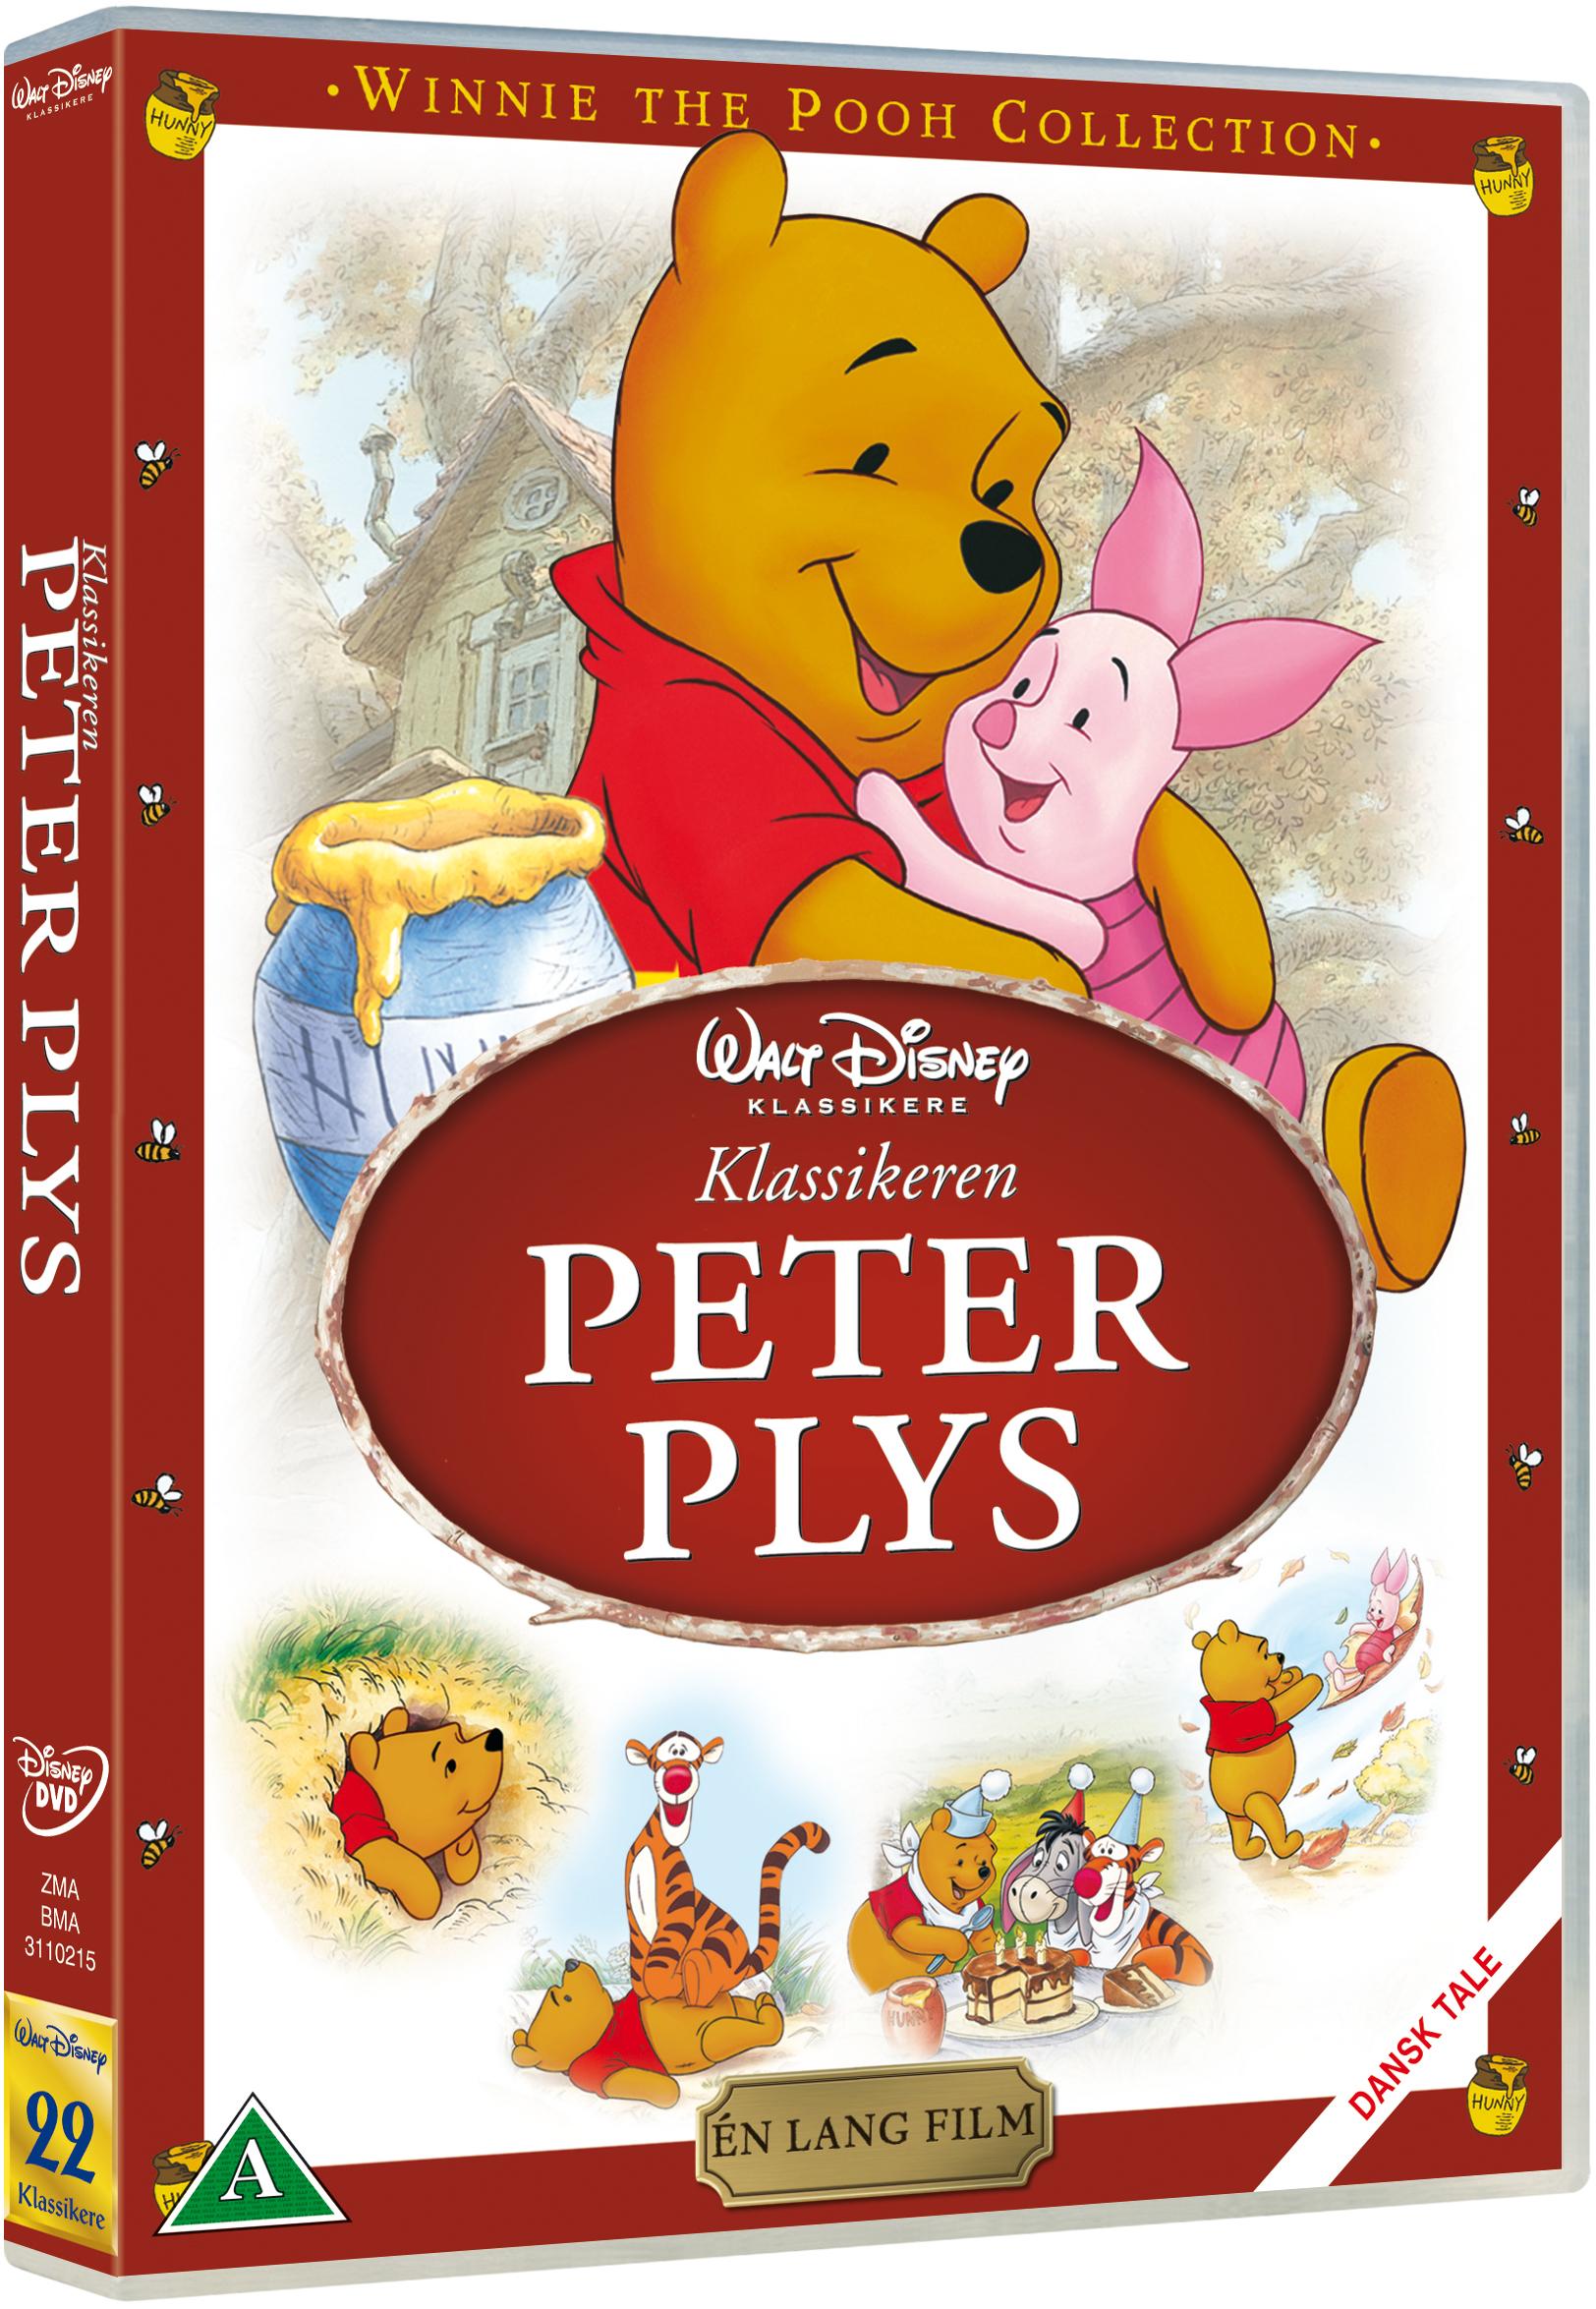 Peter Plys Disney classic #22